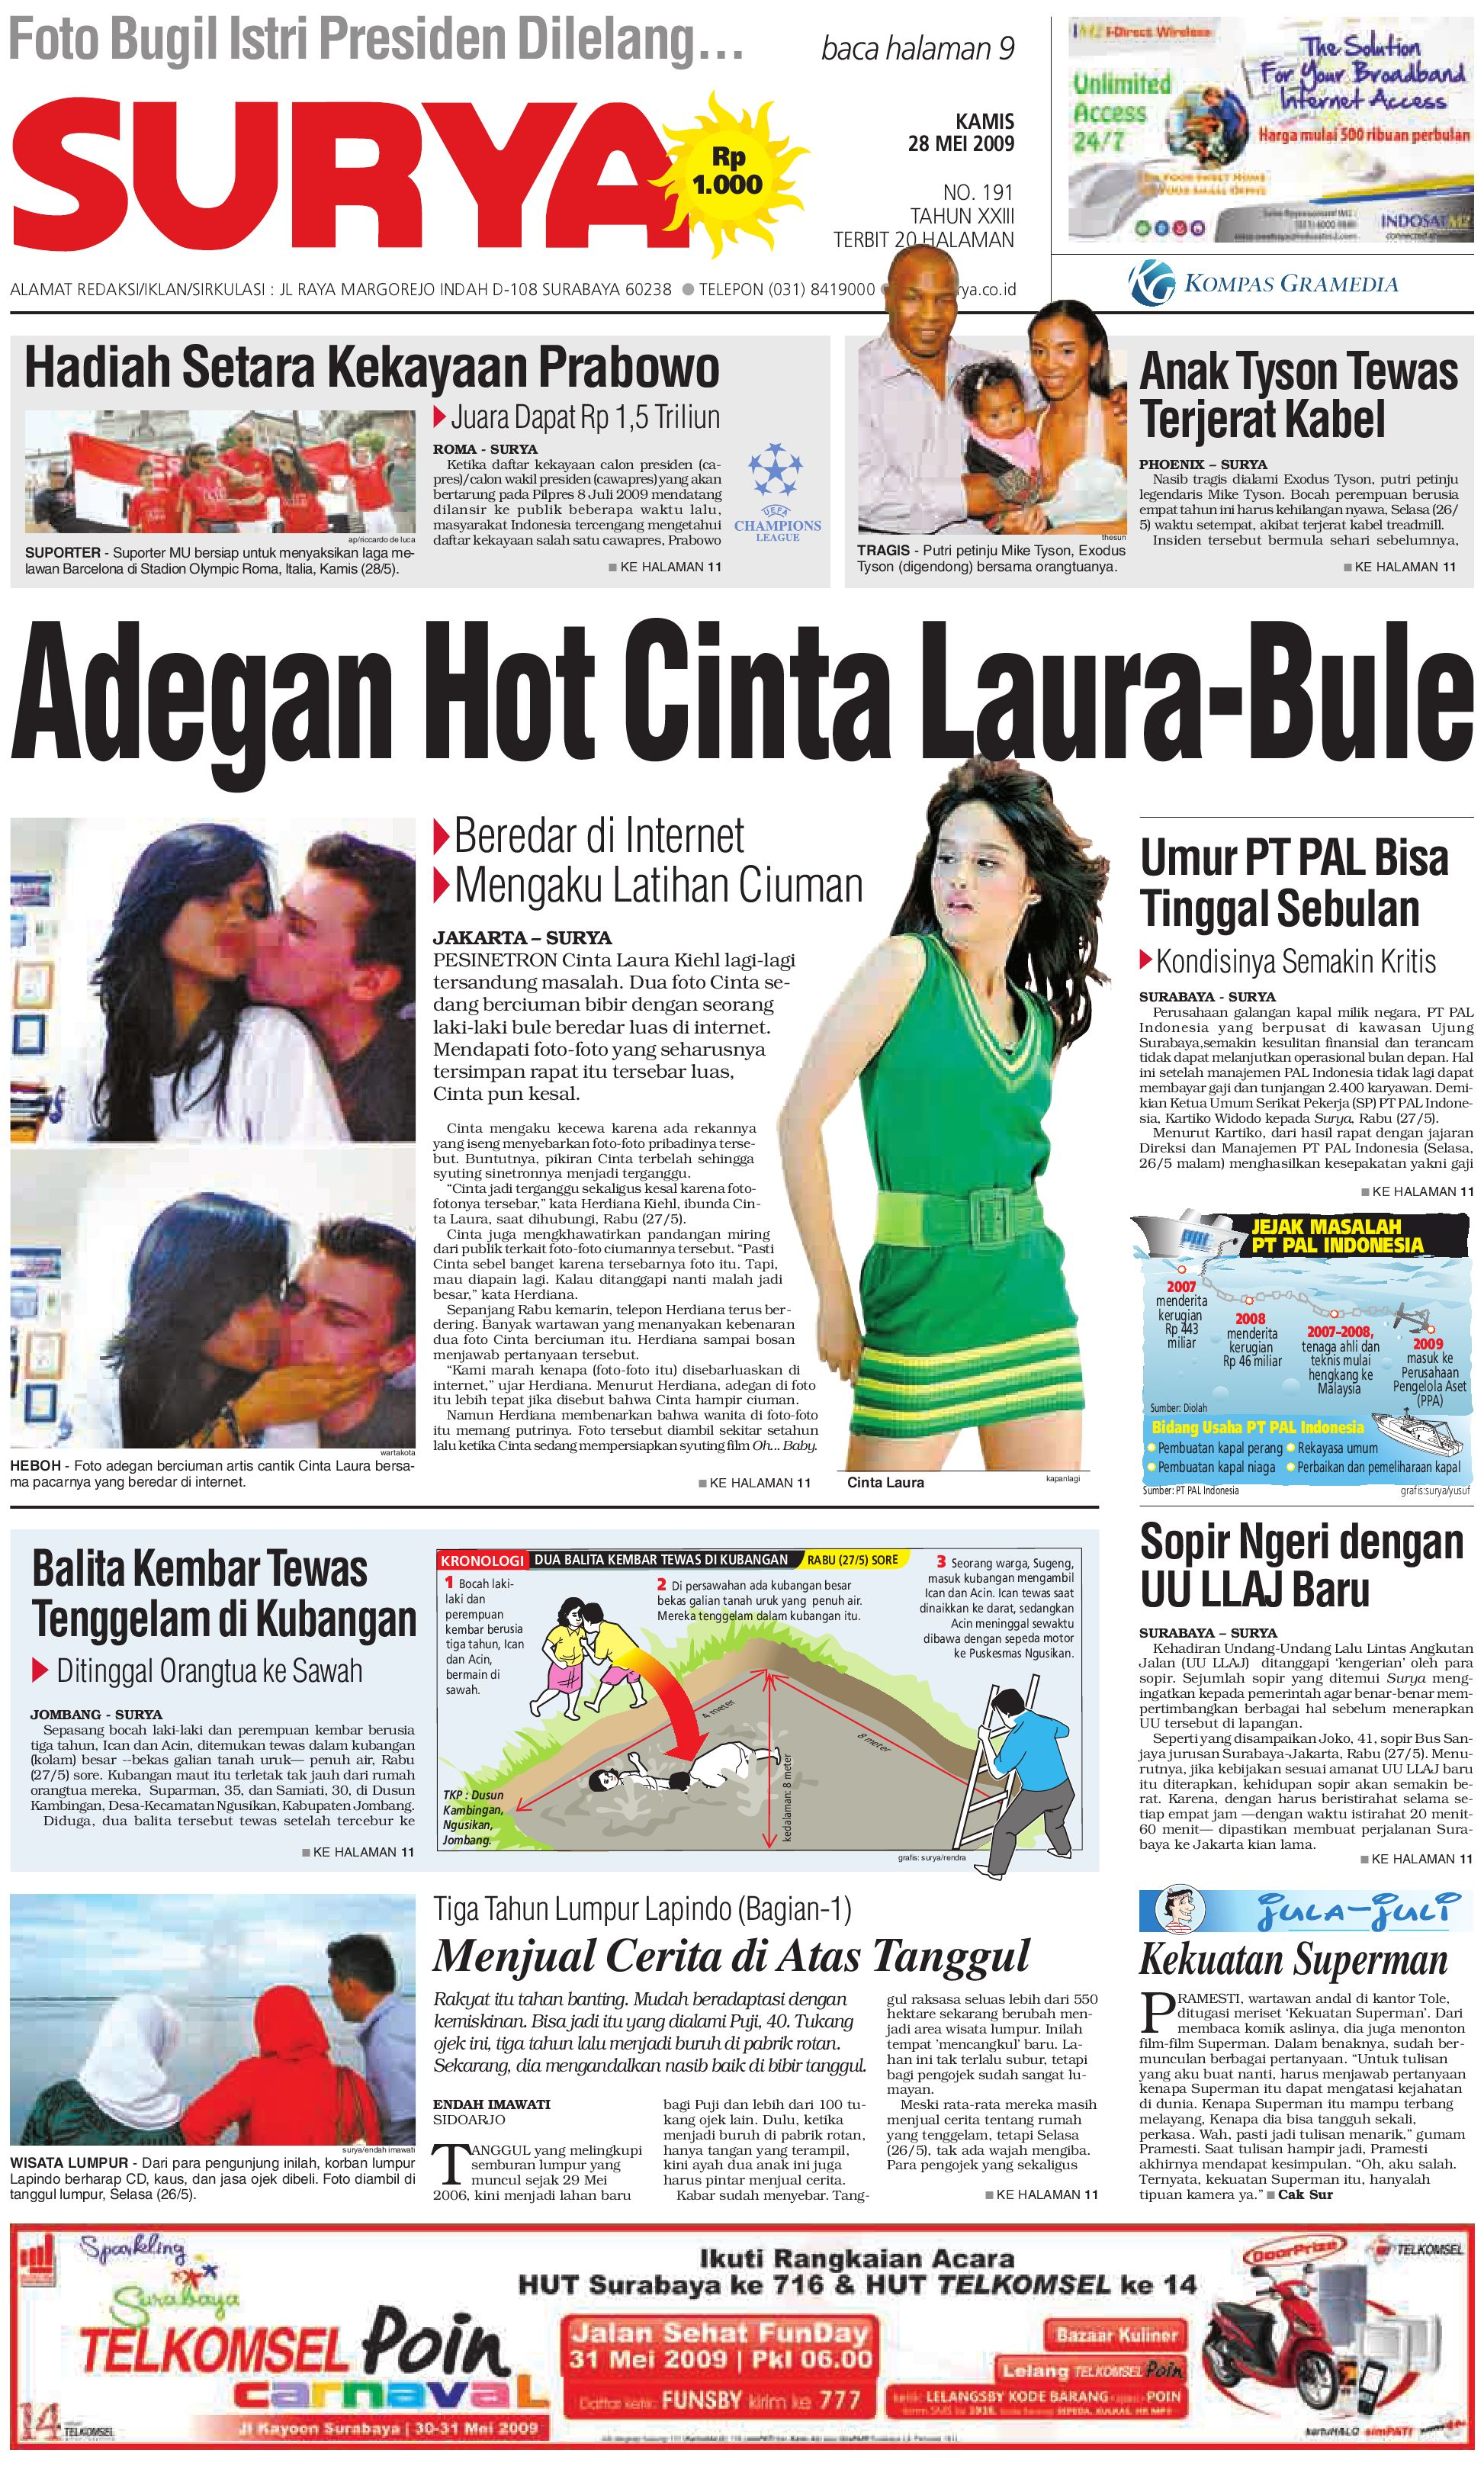 Surya Edisi Cetak 27 Mei 2009 By Harian Issuu Rkb Tegal Produk Ukm Bumn Emping Ubi